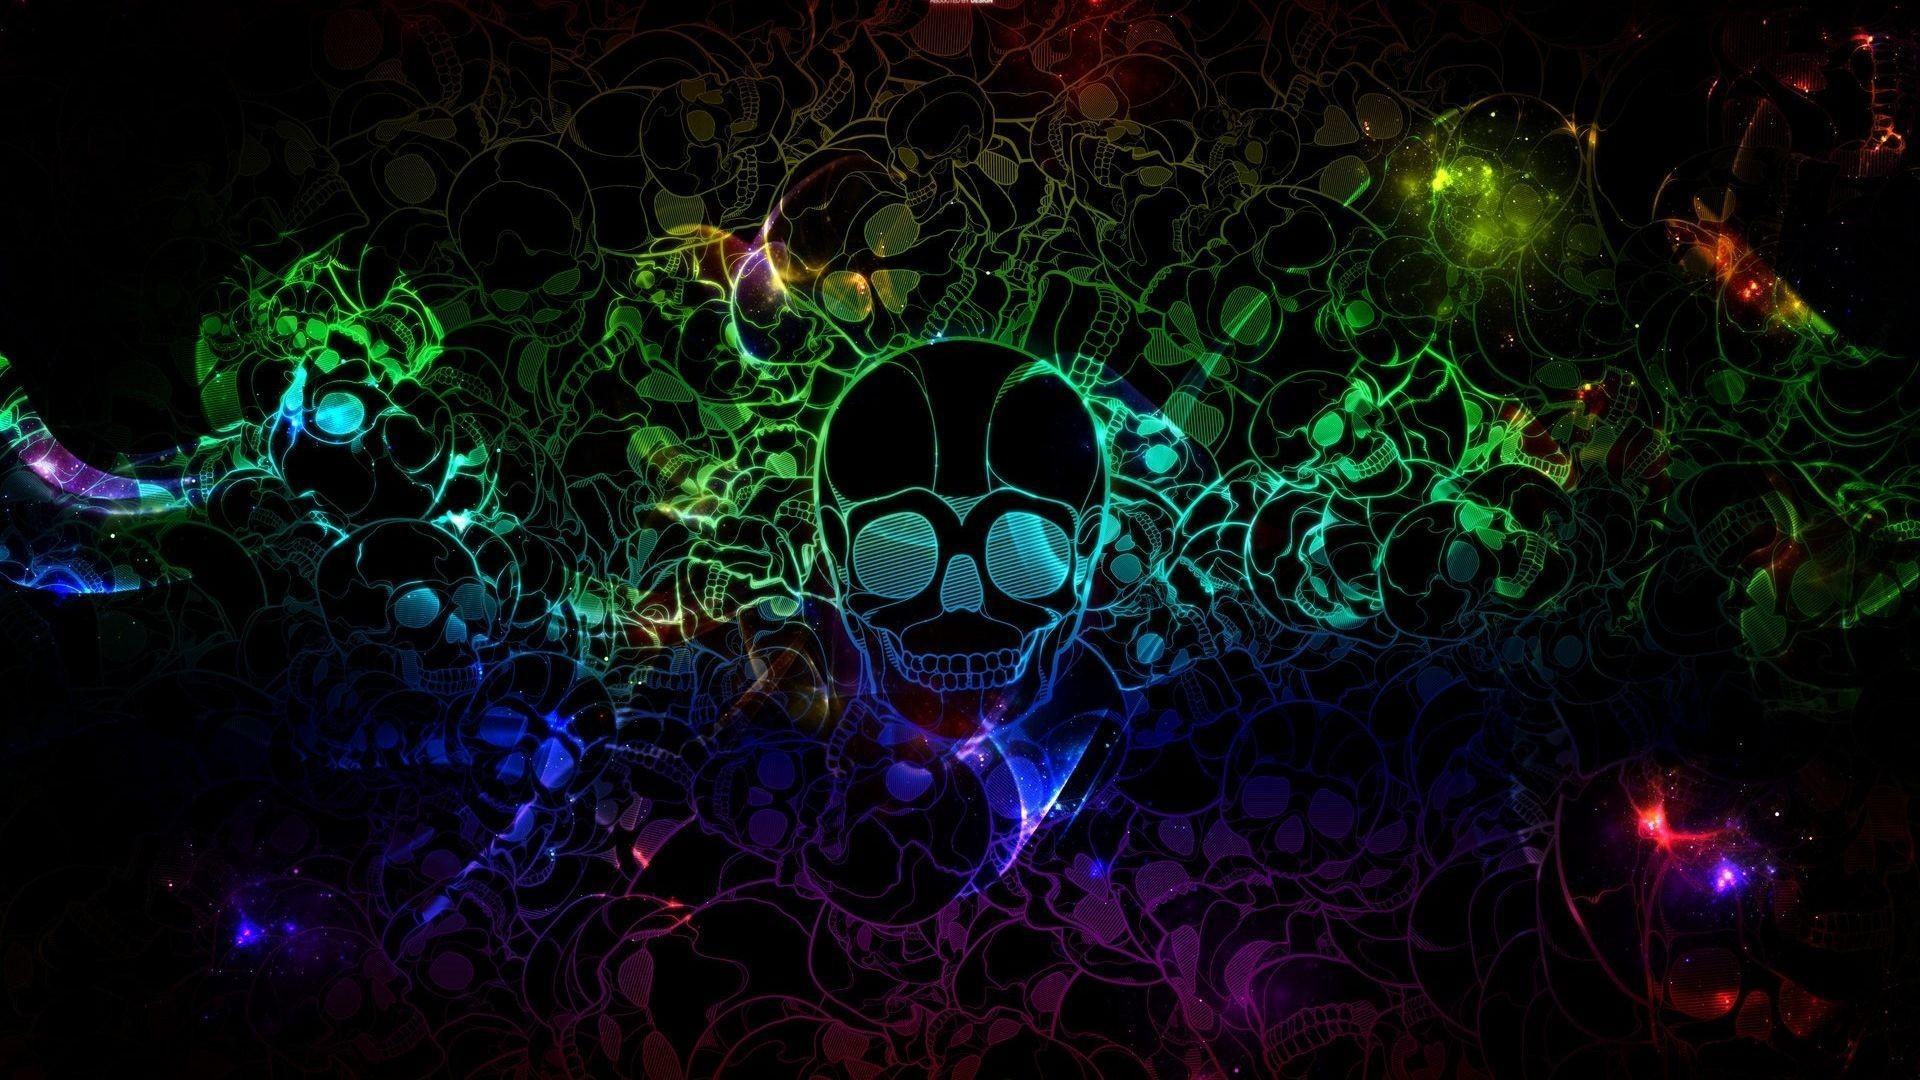 skull wallpapers download – Wallpaper